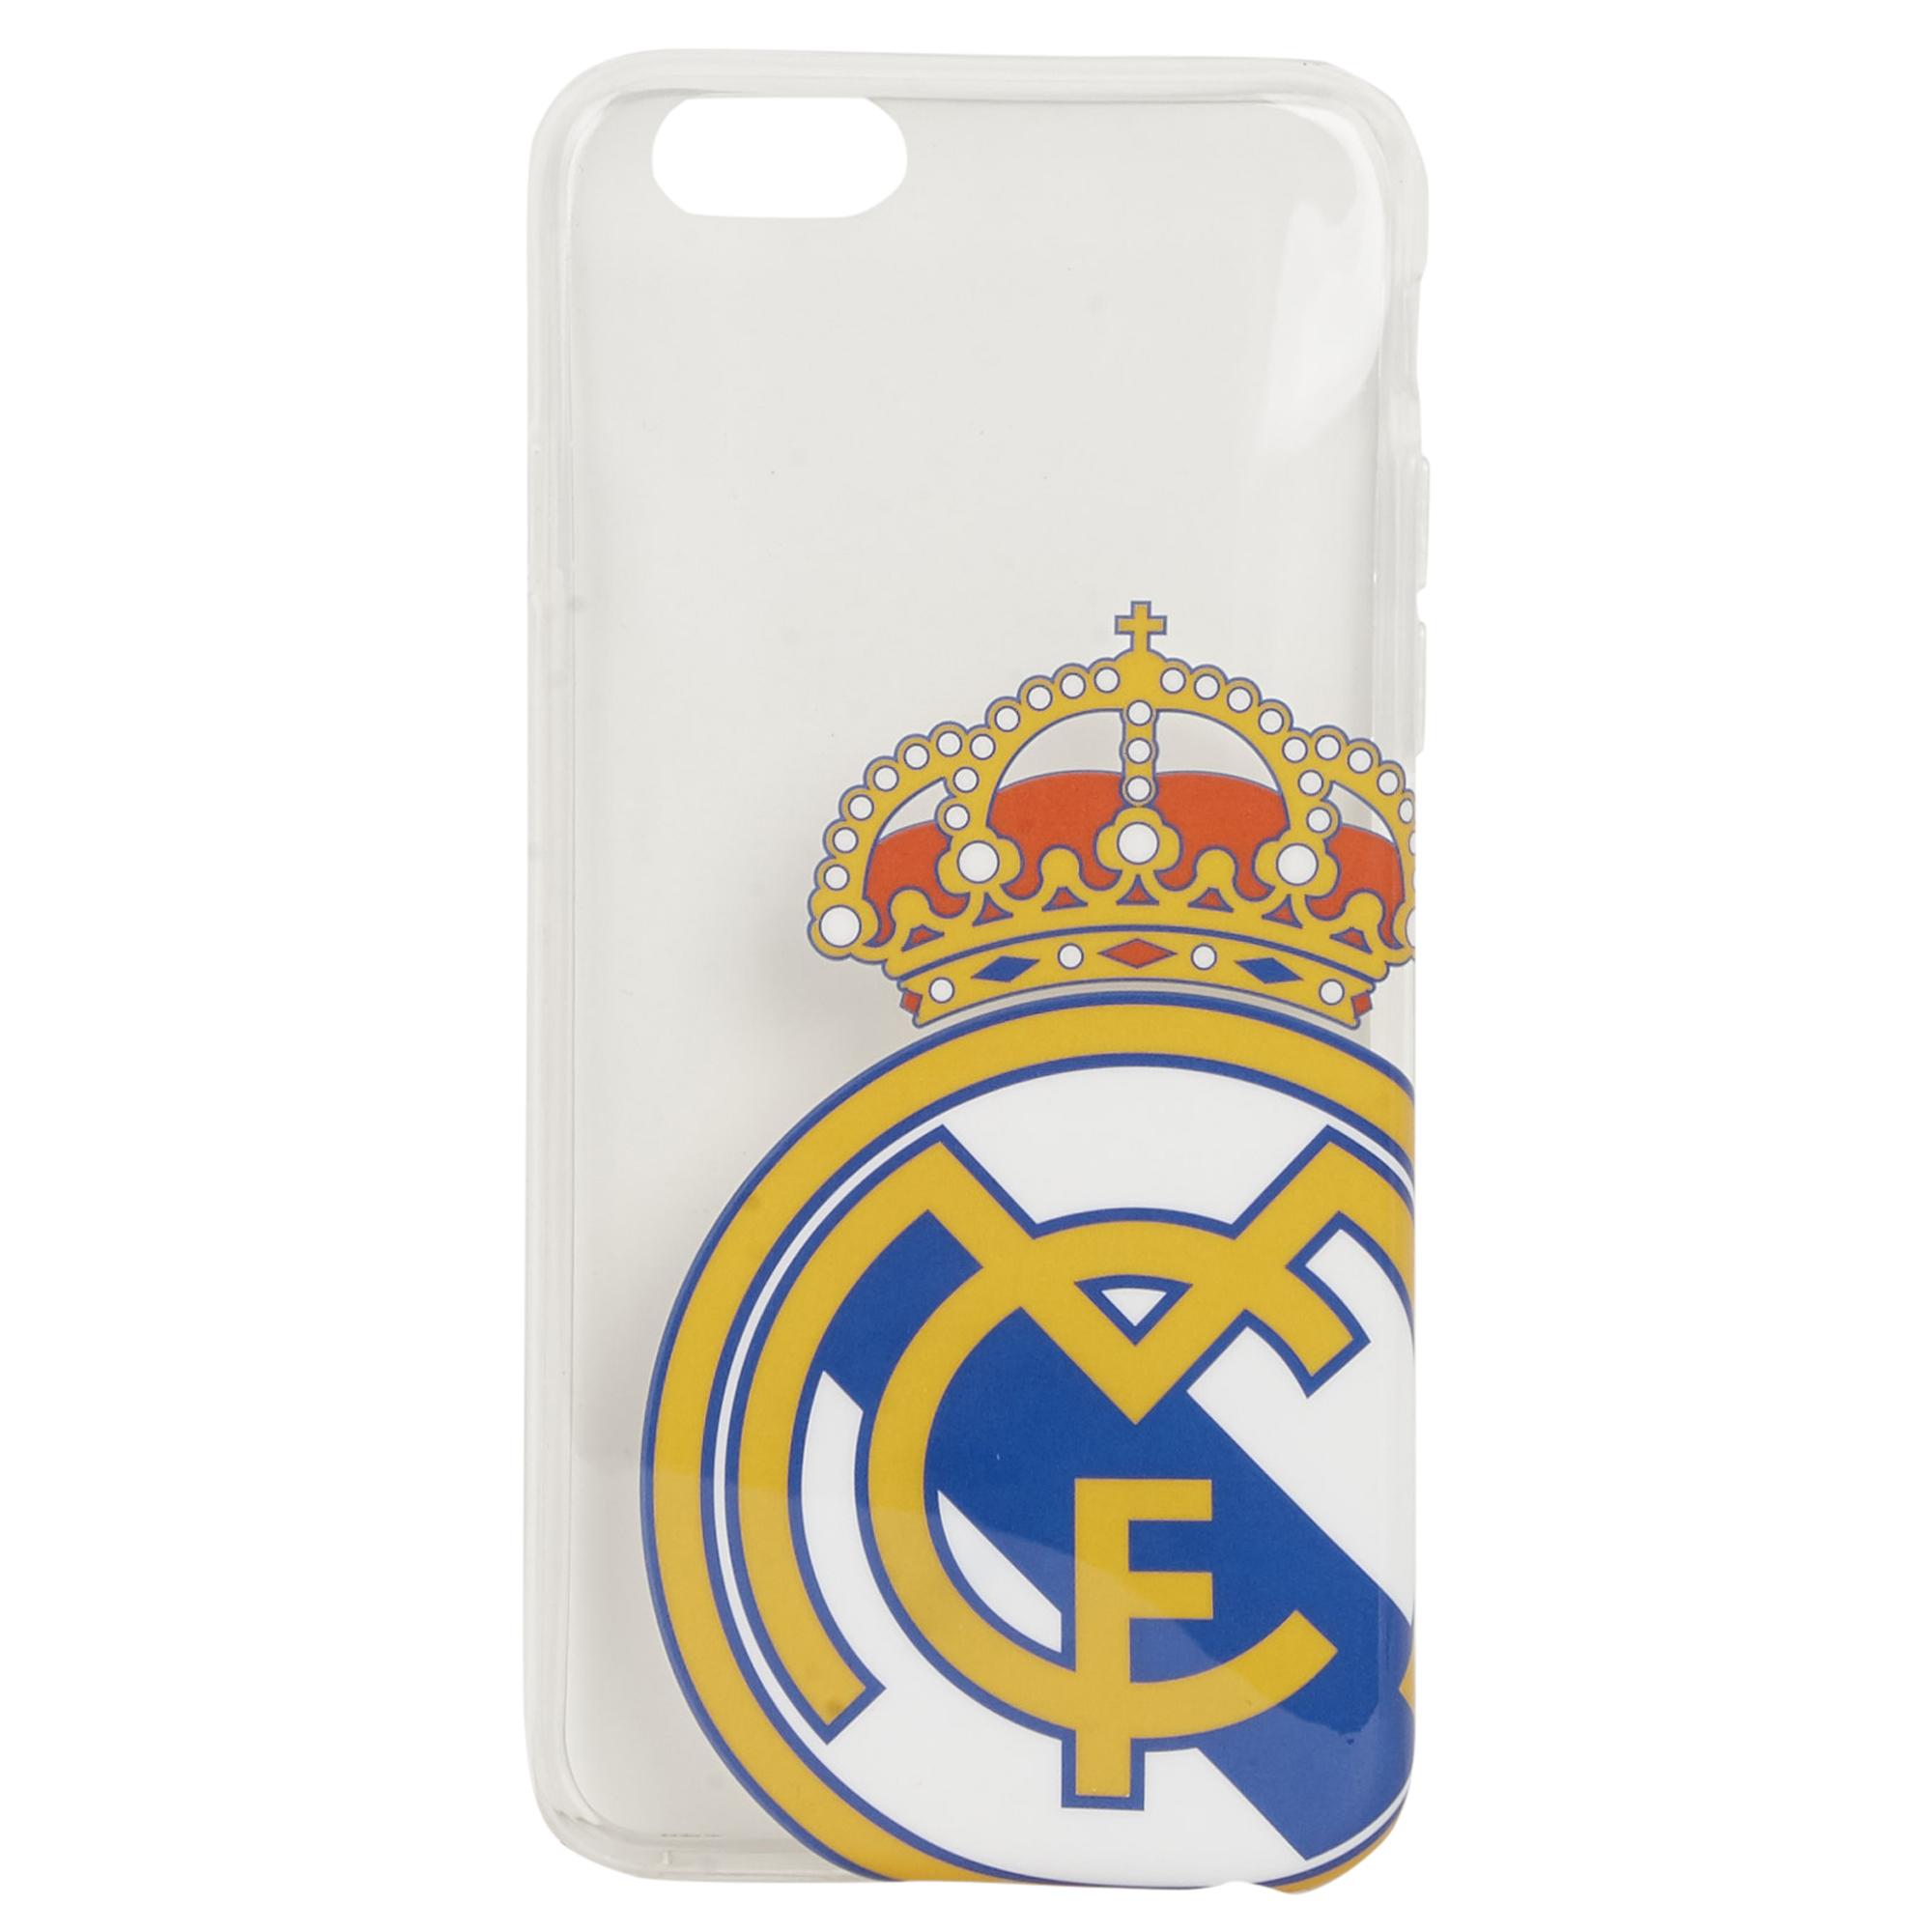 Coque en TPU pour iPhone6 Real Madrid - Transparente